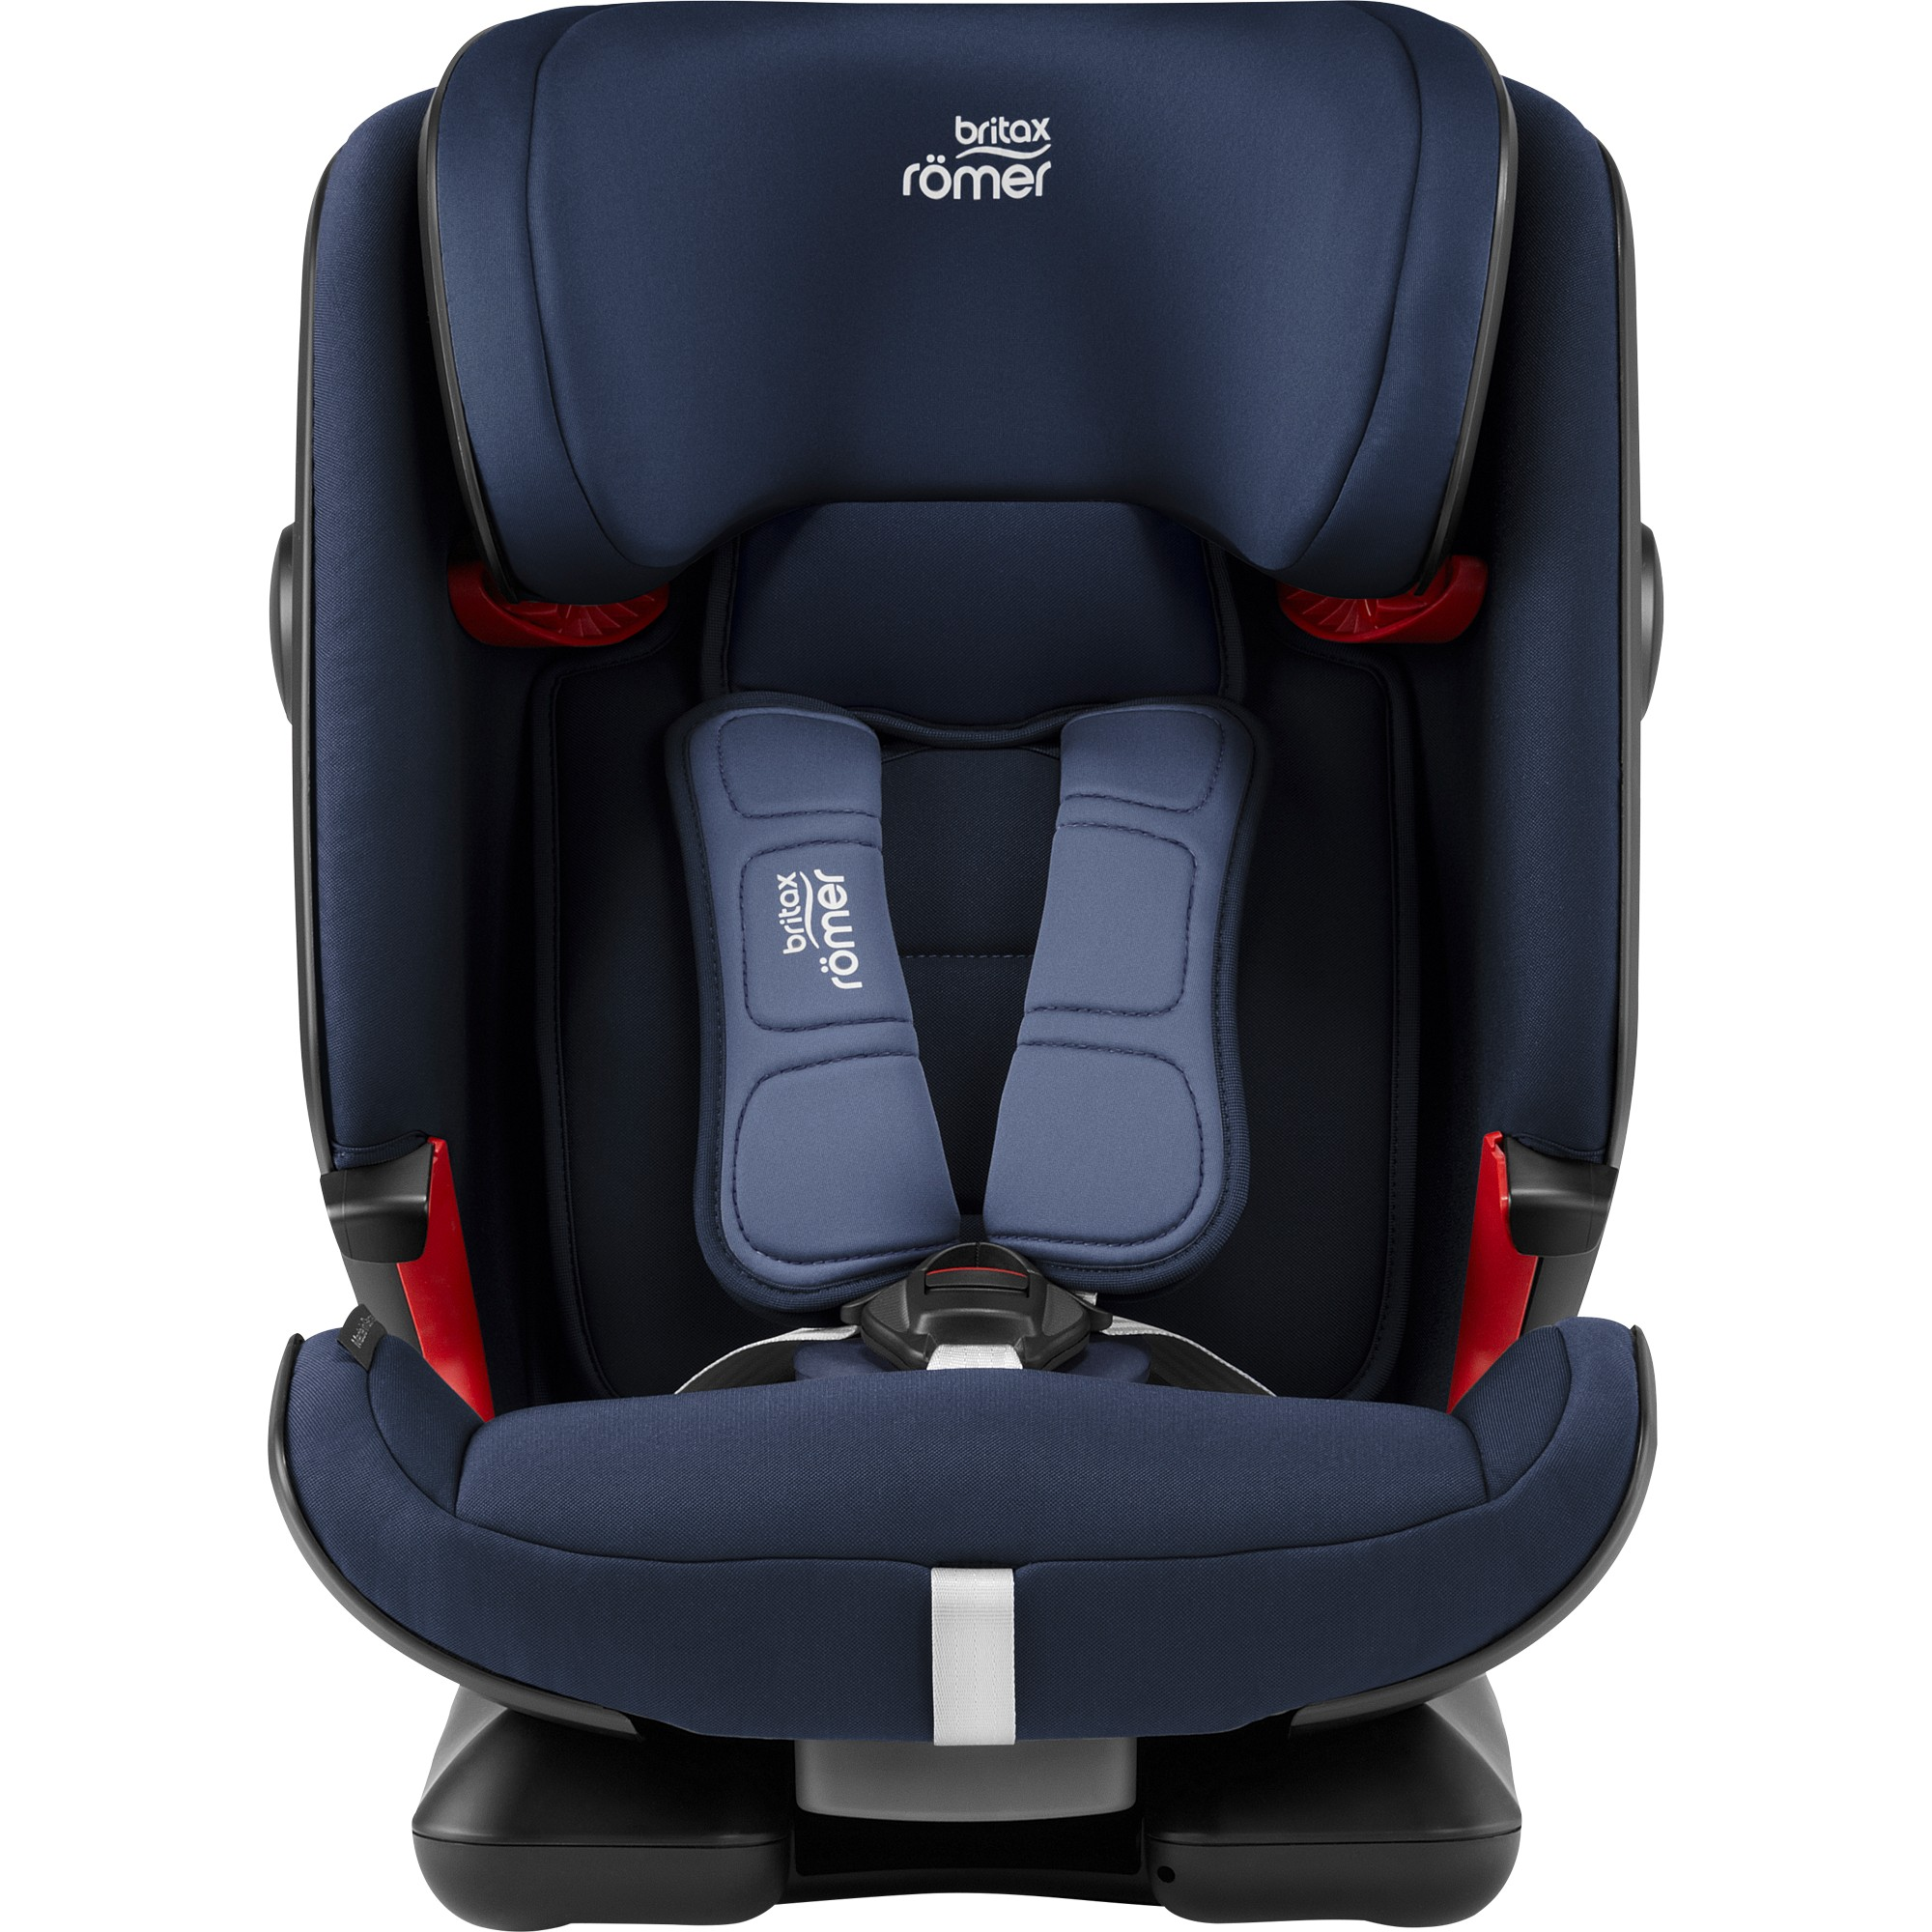 Britax-Romer-ADVANSAFIX-IV-R-Group-1-2-3-Child-Car-Seat thumbnail 3